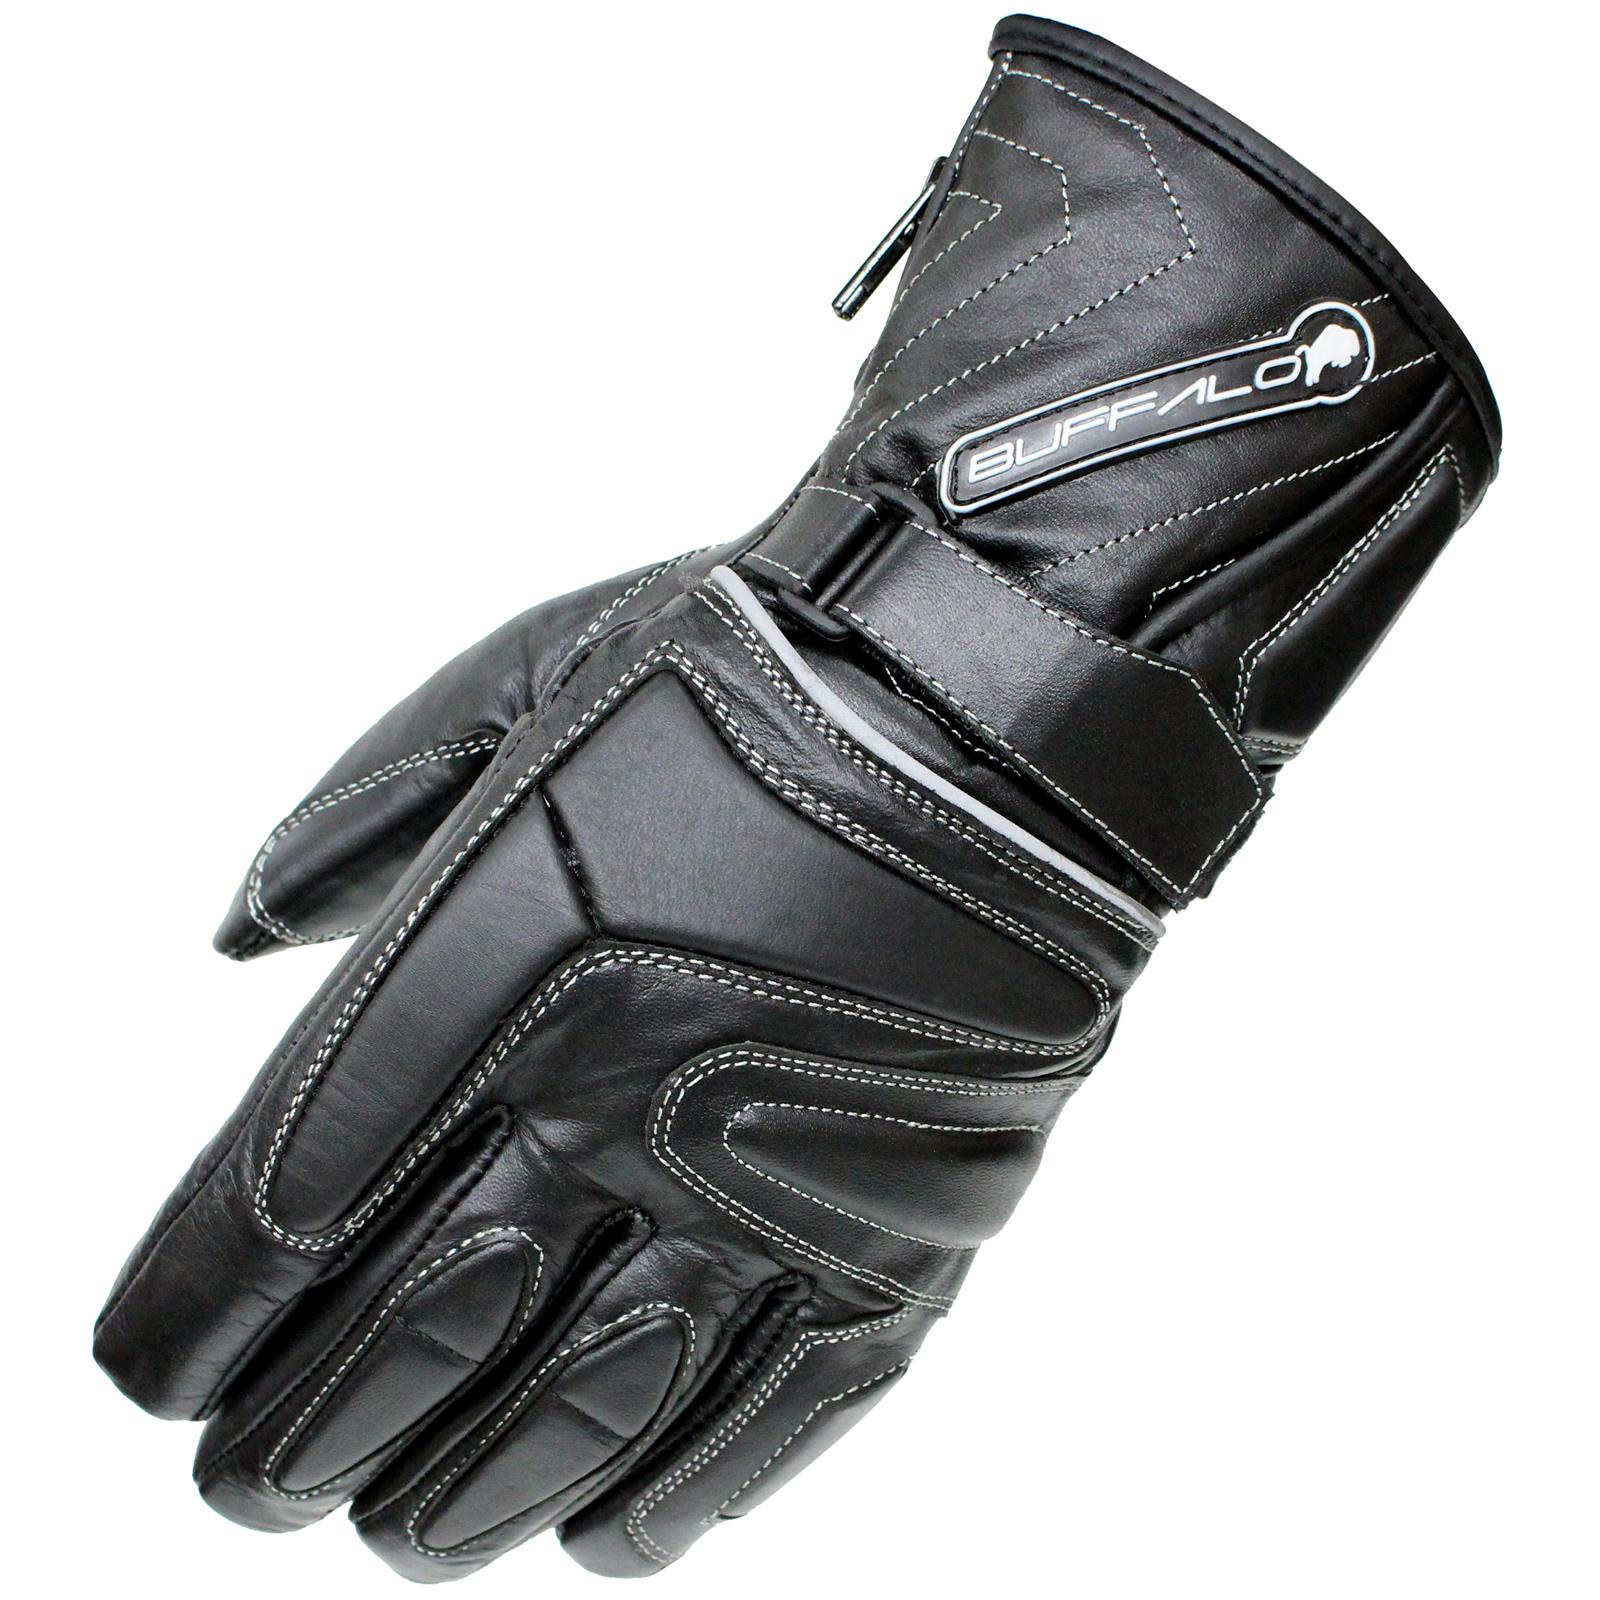 Motorcycle leather gloves waterproof - Buffalo Arctic Waterproof Wp Thermal Leather Motorcycle Scooter